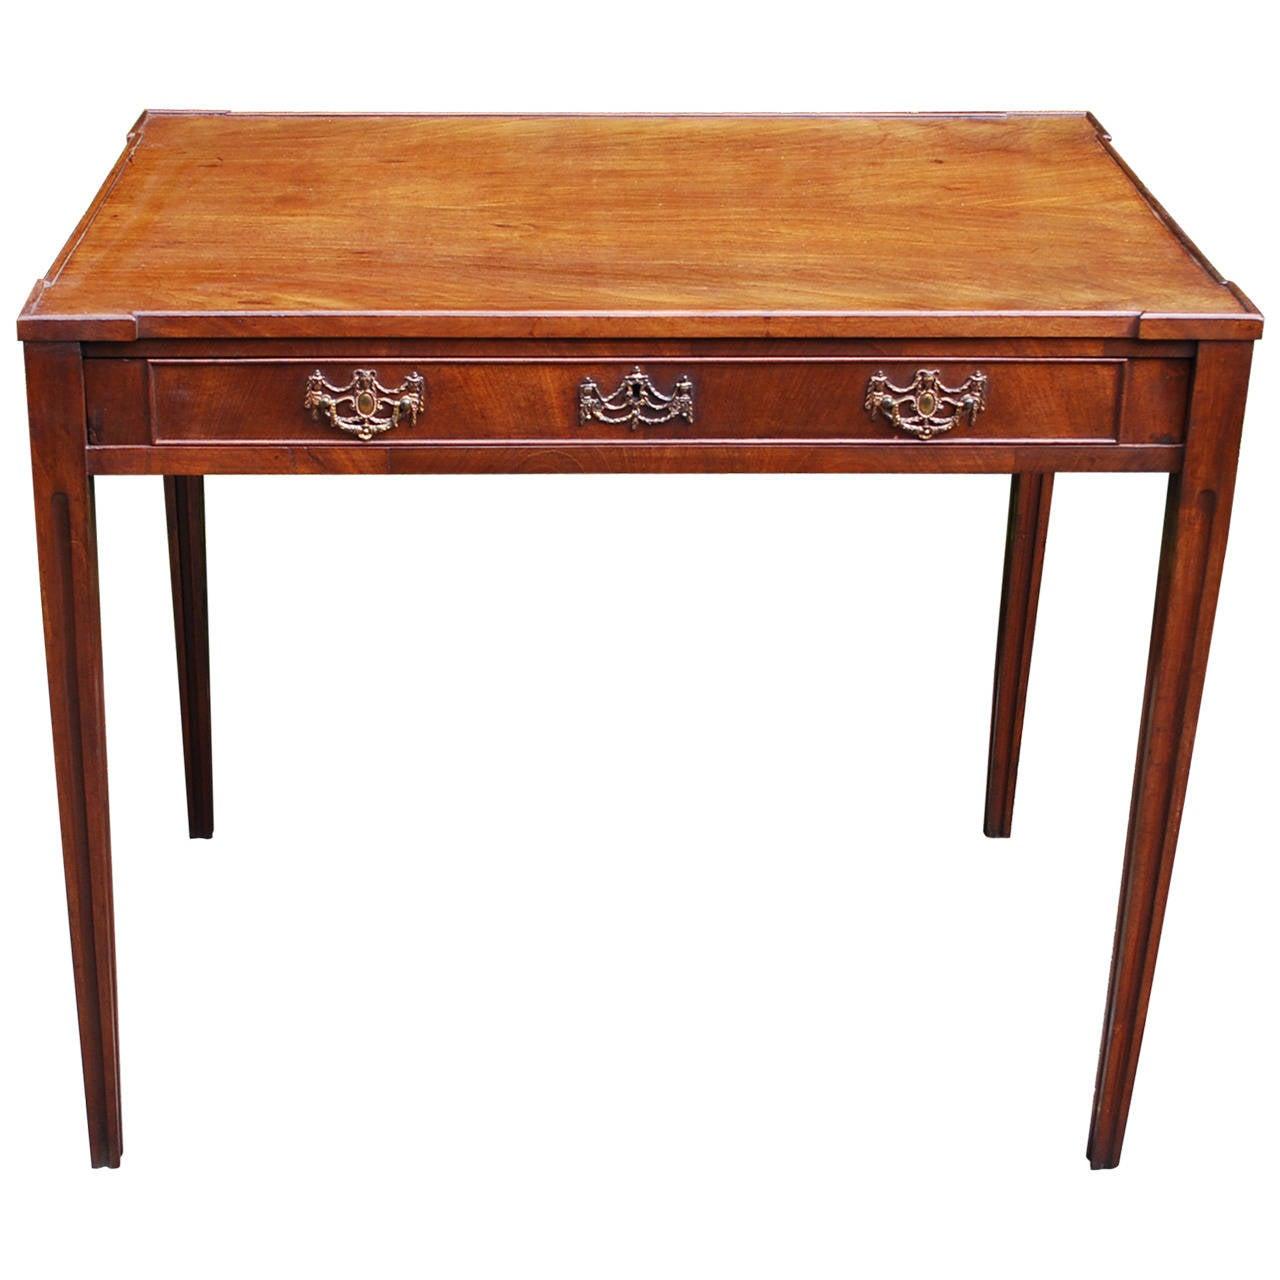 18th Century Louis XVI Mahogany Side Table